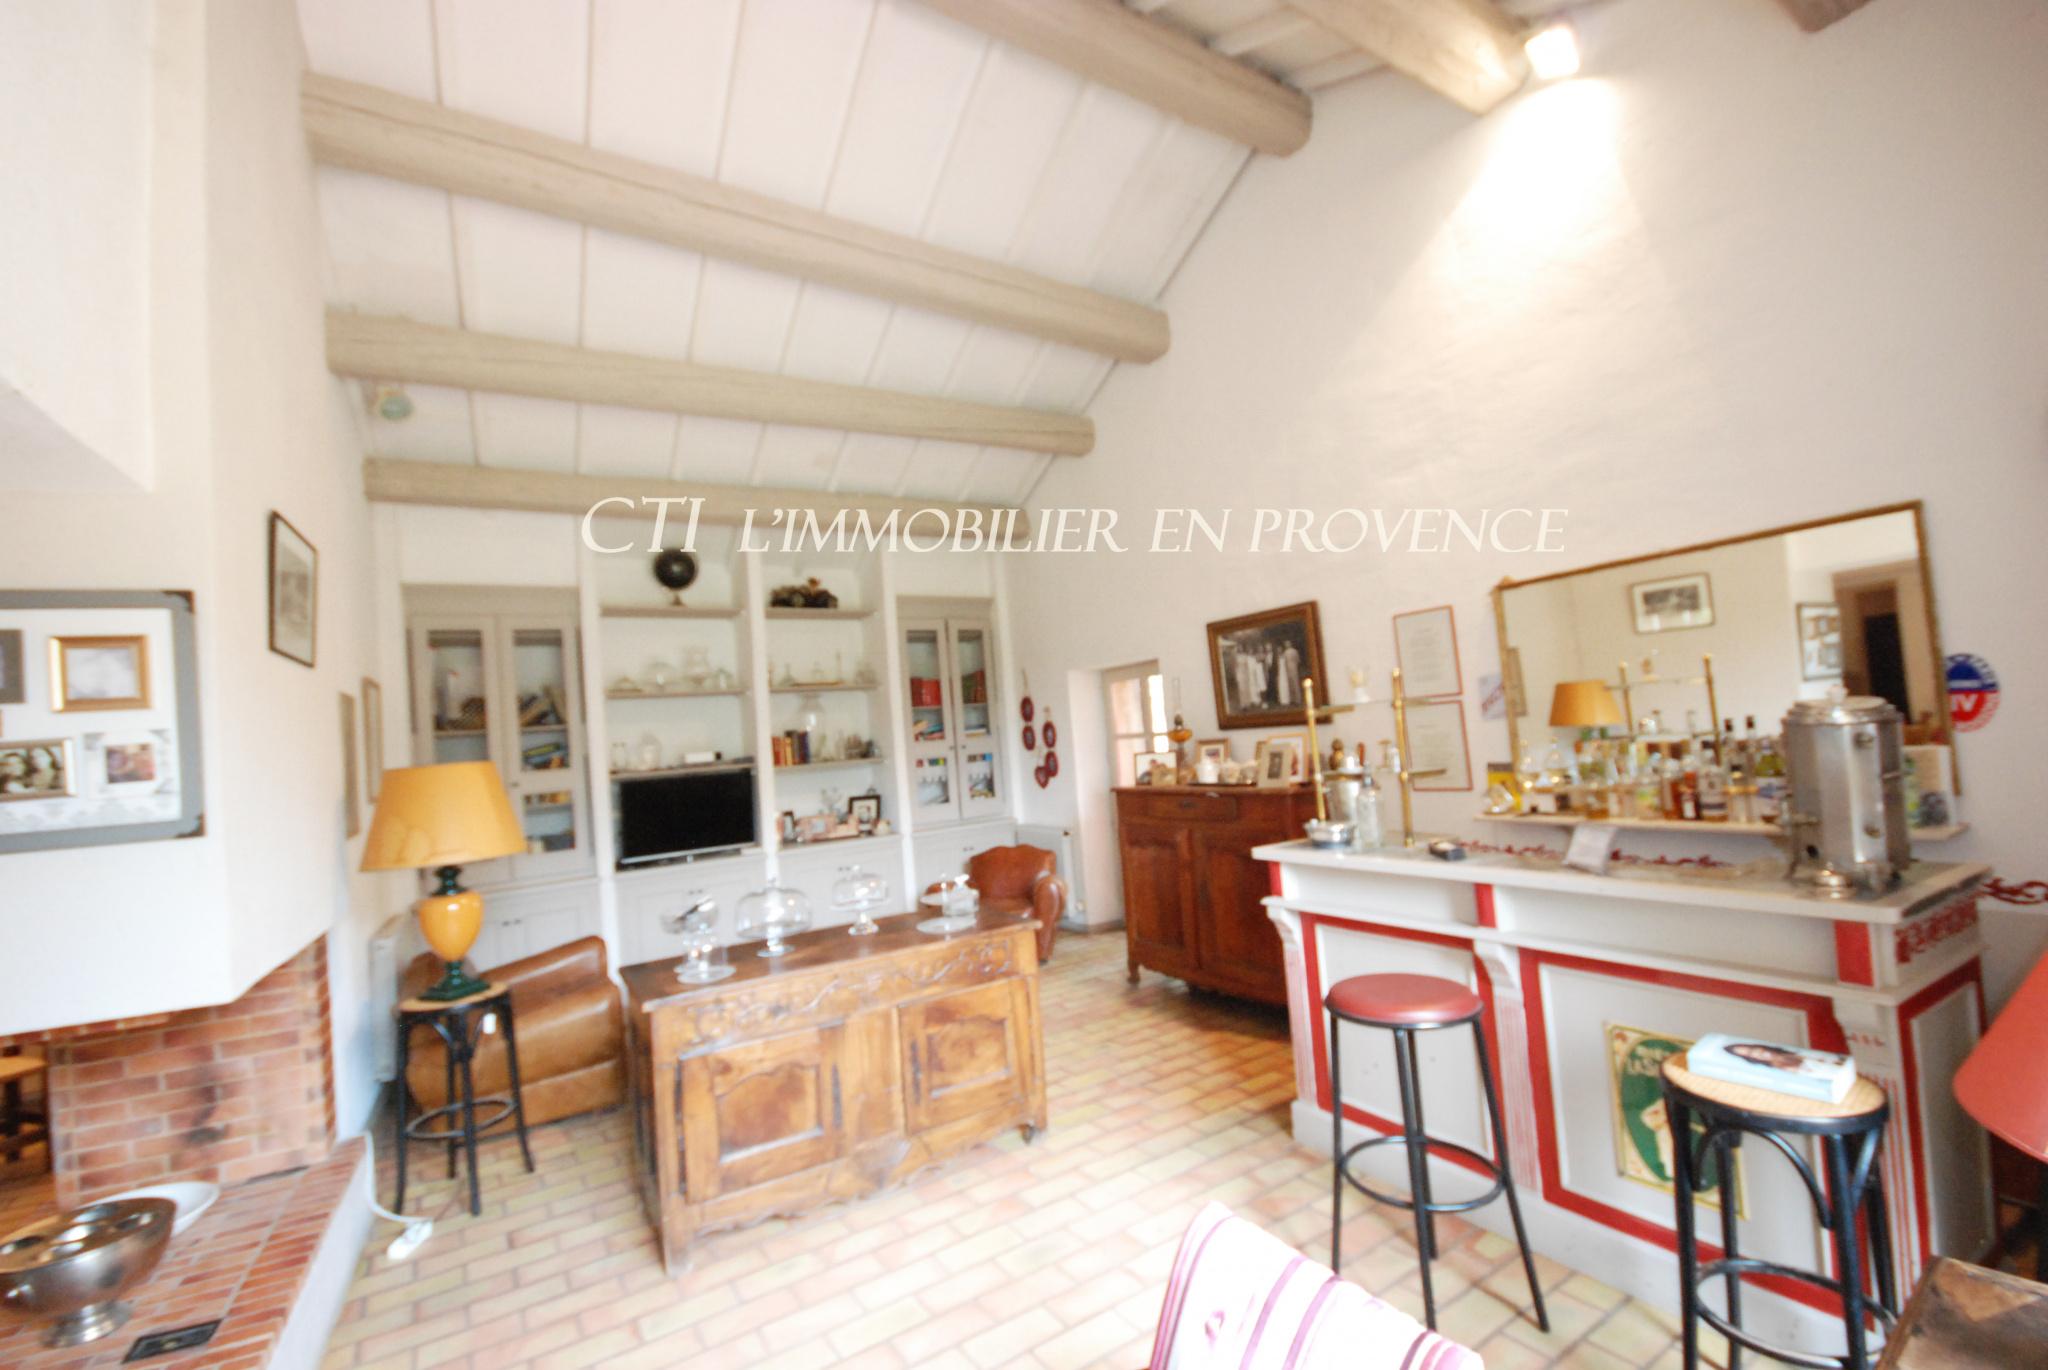 0 www.cti-provence.net A VENDRE MAS DEMEURE PROVENÇAL JARDIN PARC PISCINE GARAGE MORNAS